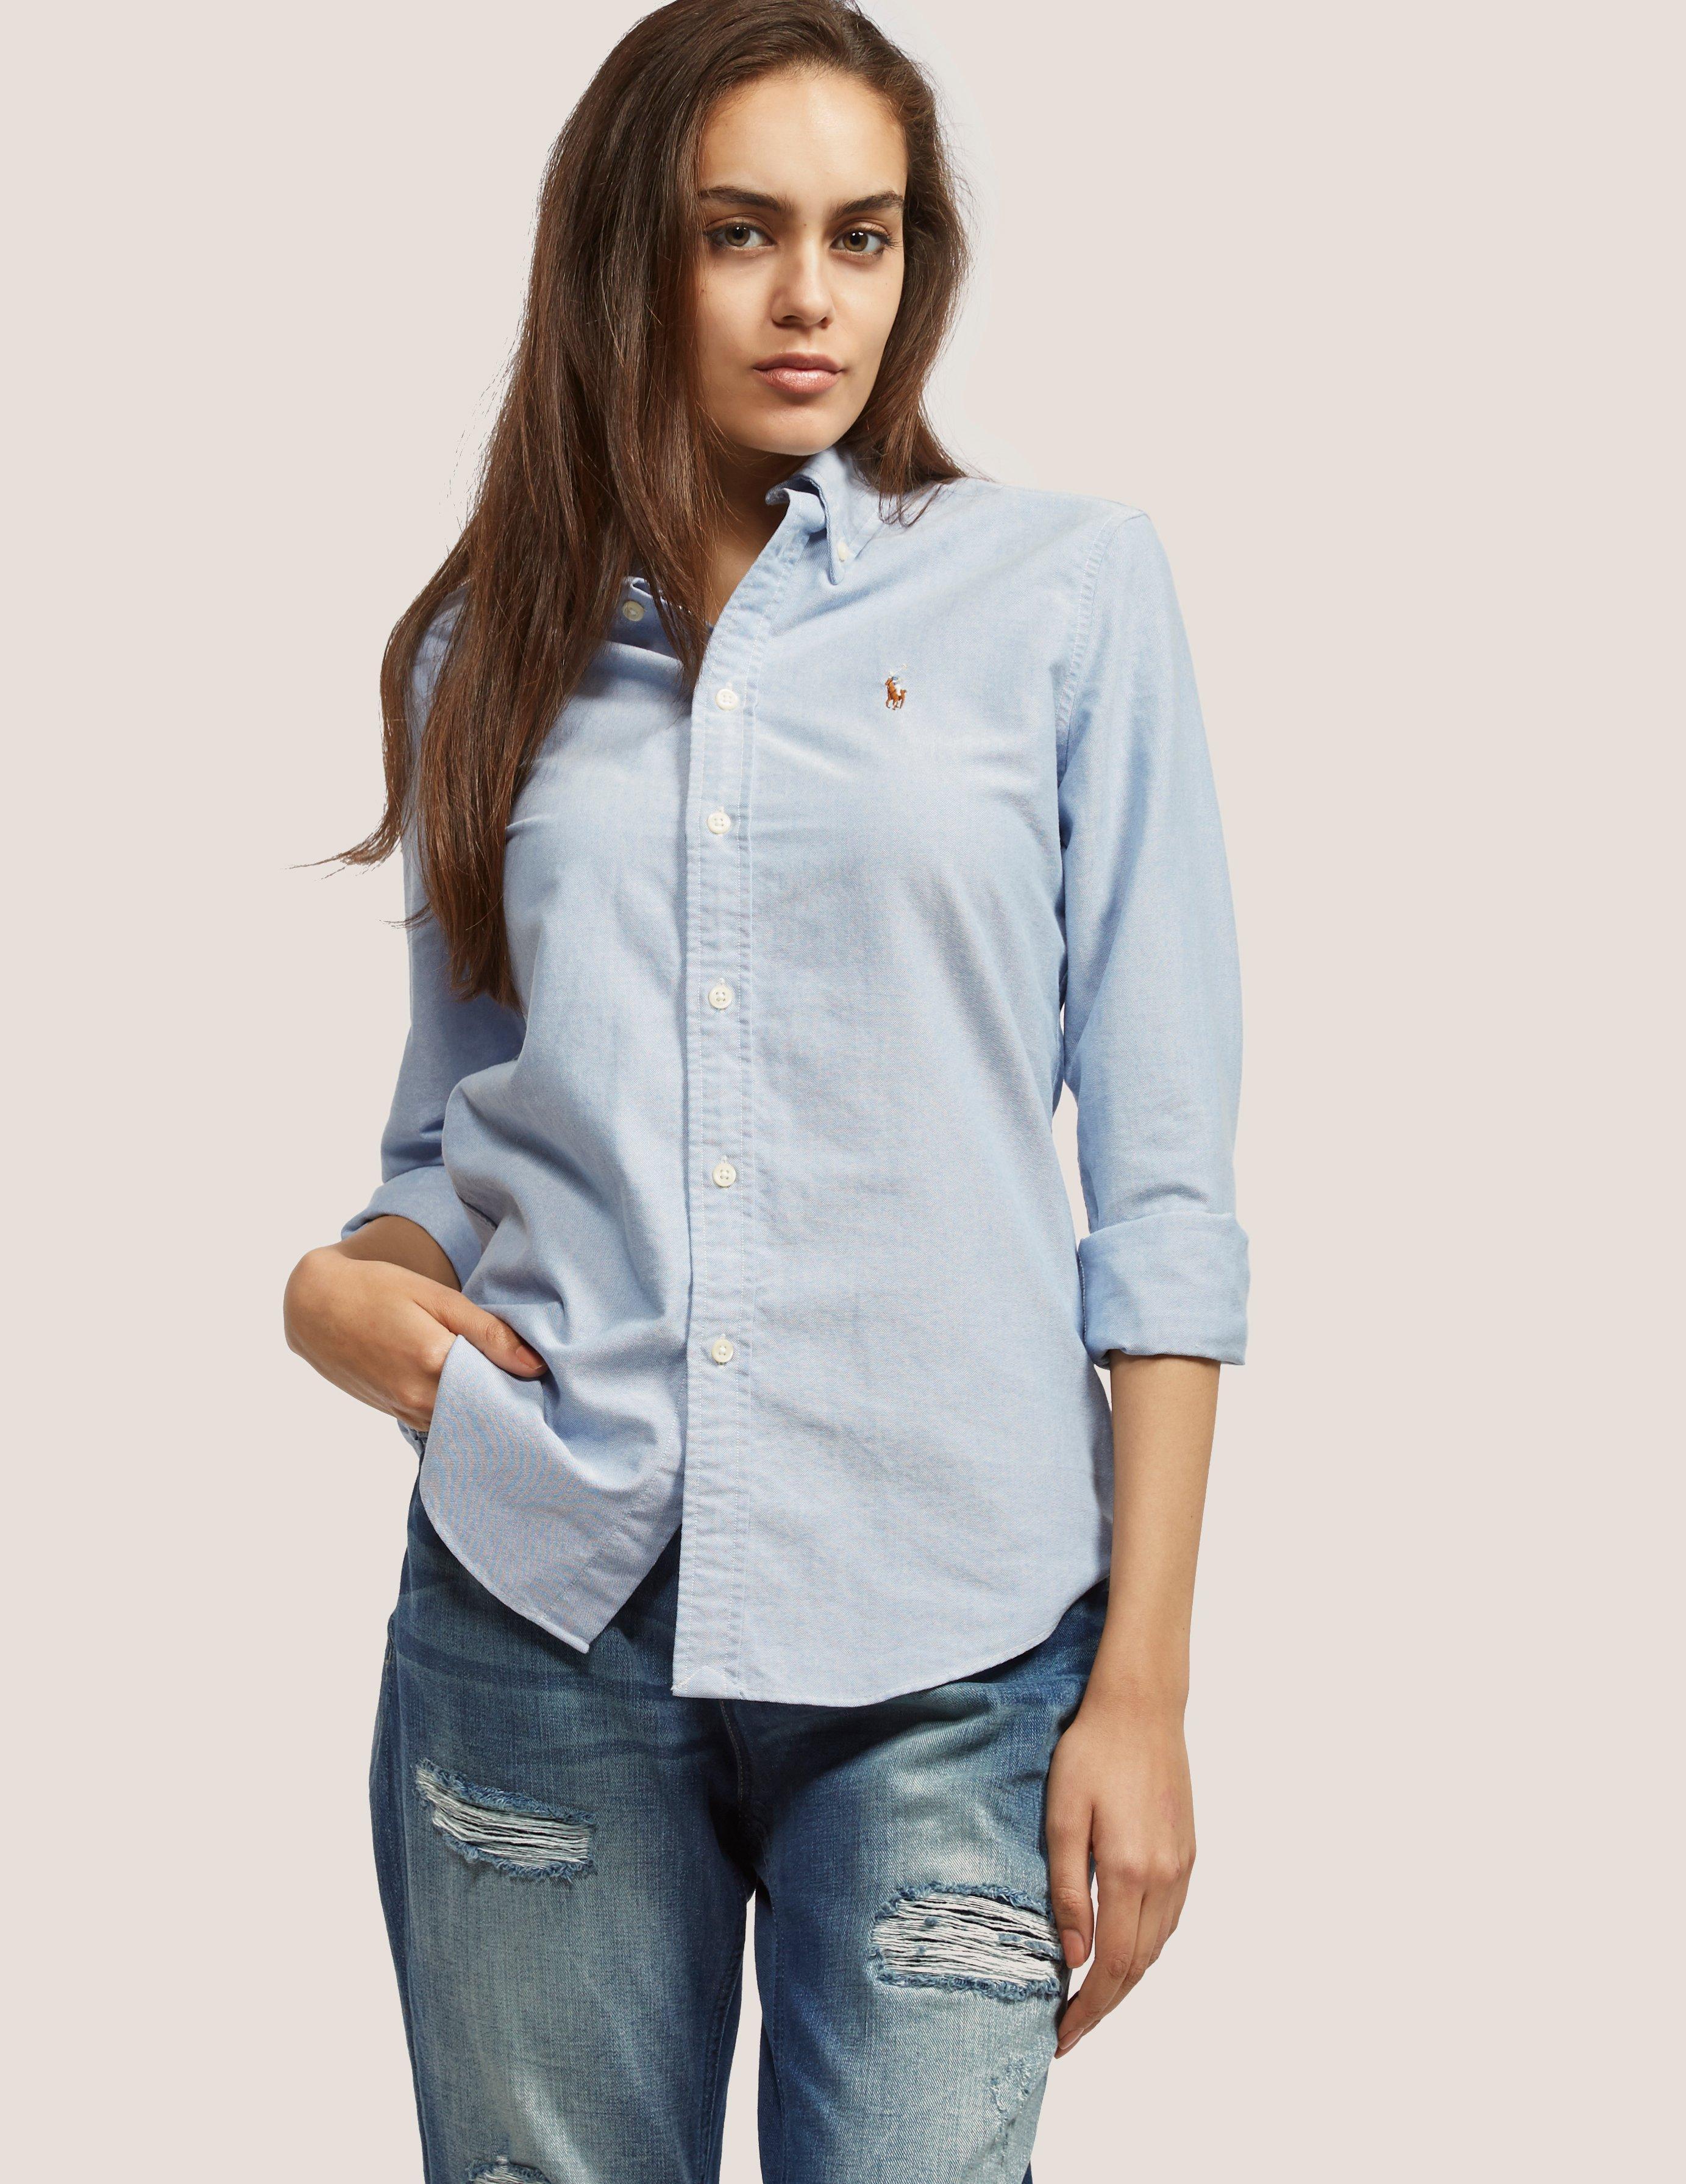 Polo Ralph Lauren Womens Harper Shirt Blue in Blue - Lyst afa76b7b6924